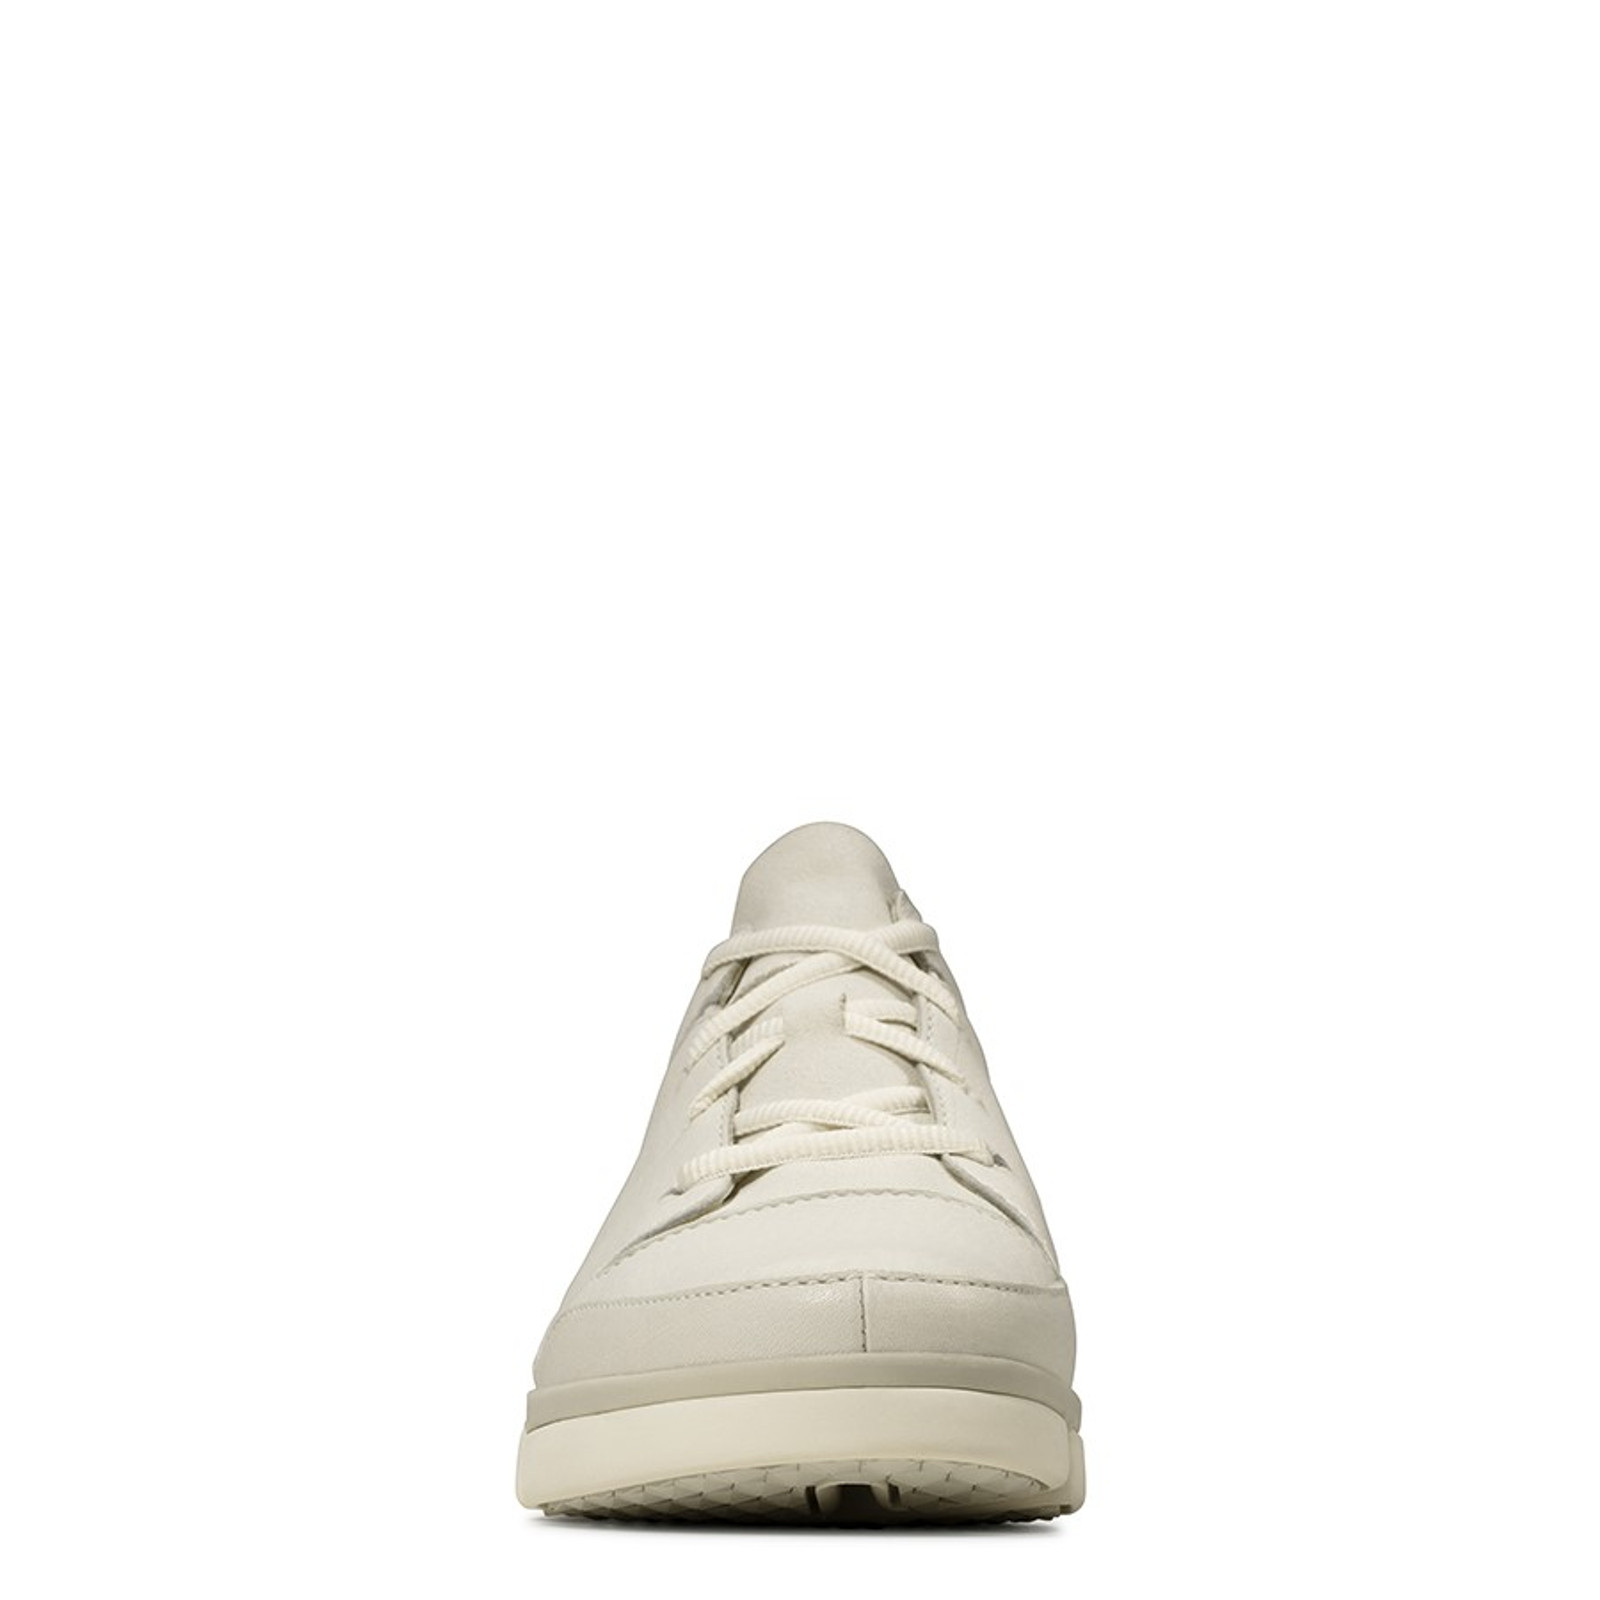 Clarks Womens TRI TURN White Leather